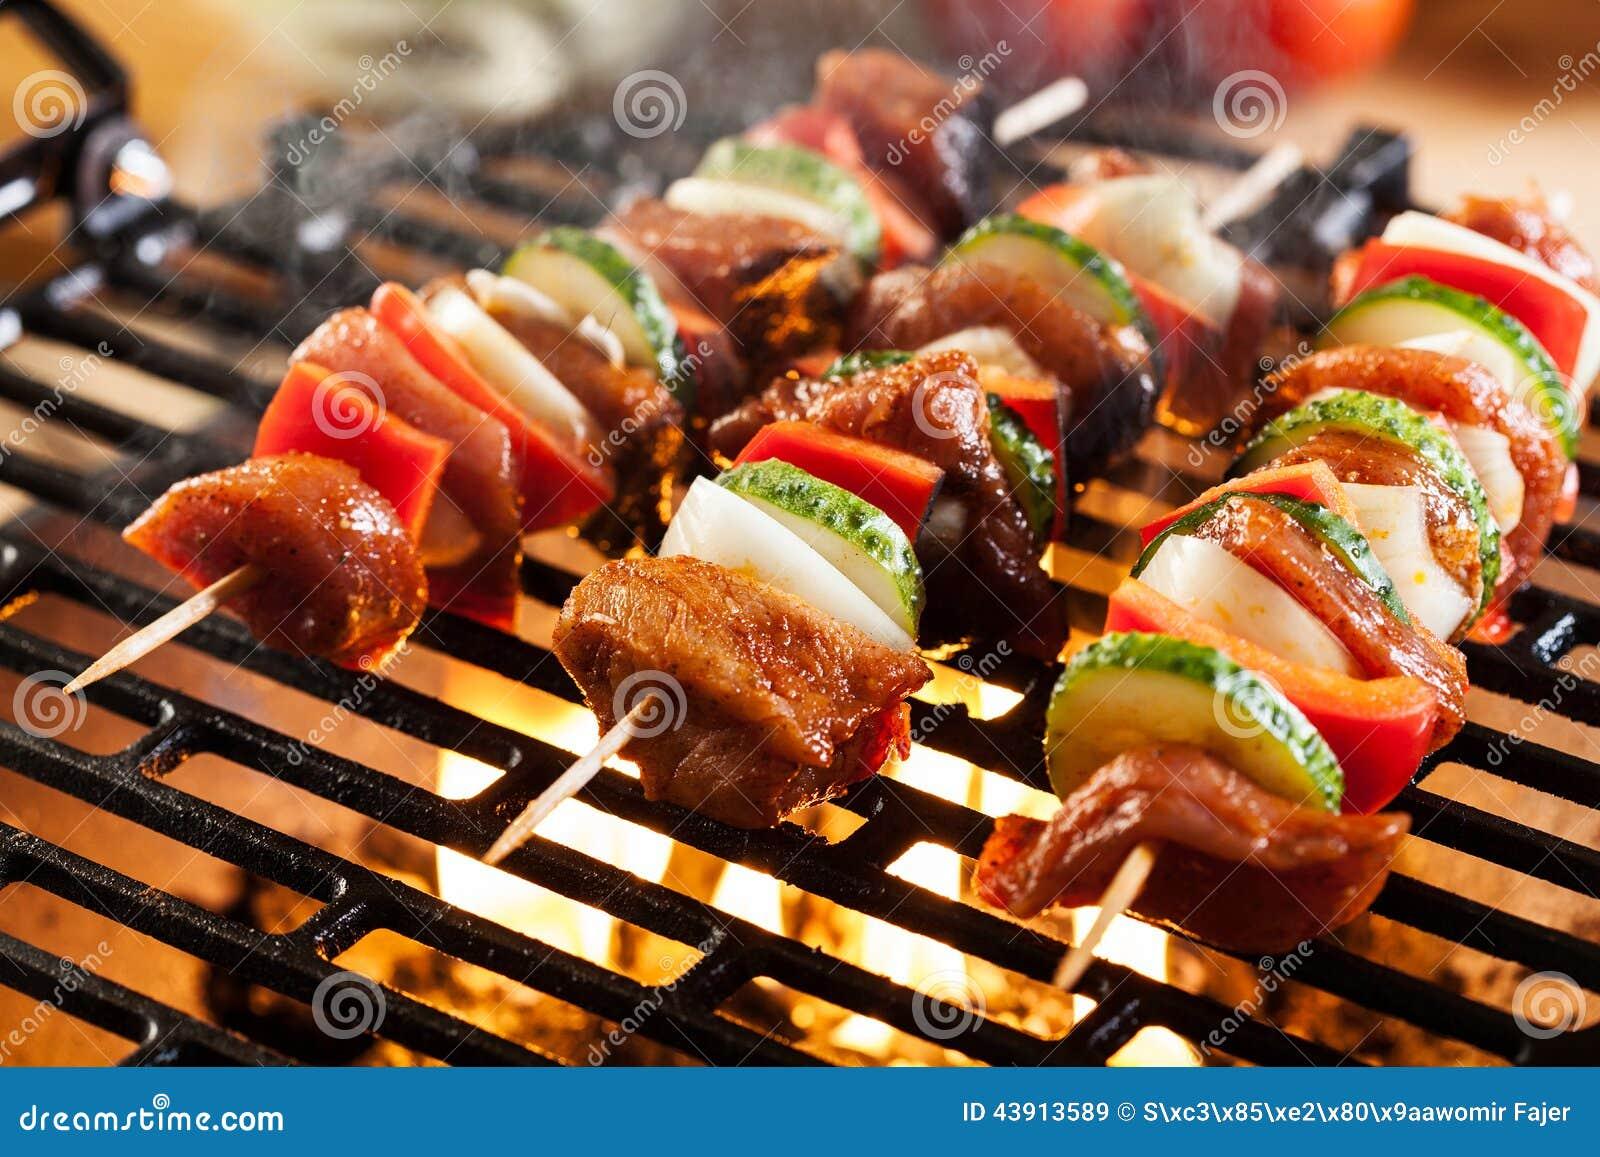 grilling shashlik on barbecue grill stock photo image. Black Bedroom Furniture Sets. Home Design Ideas